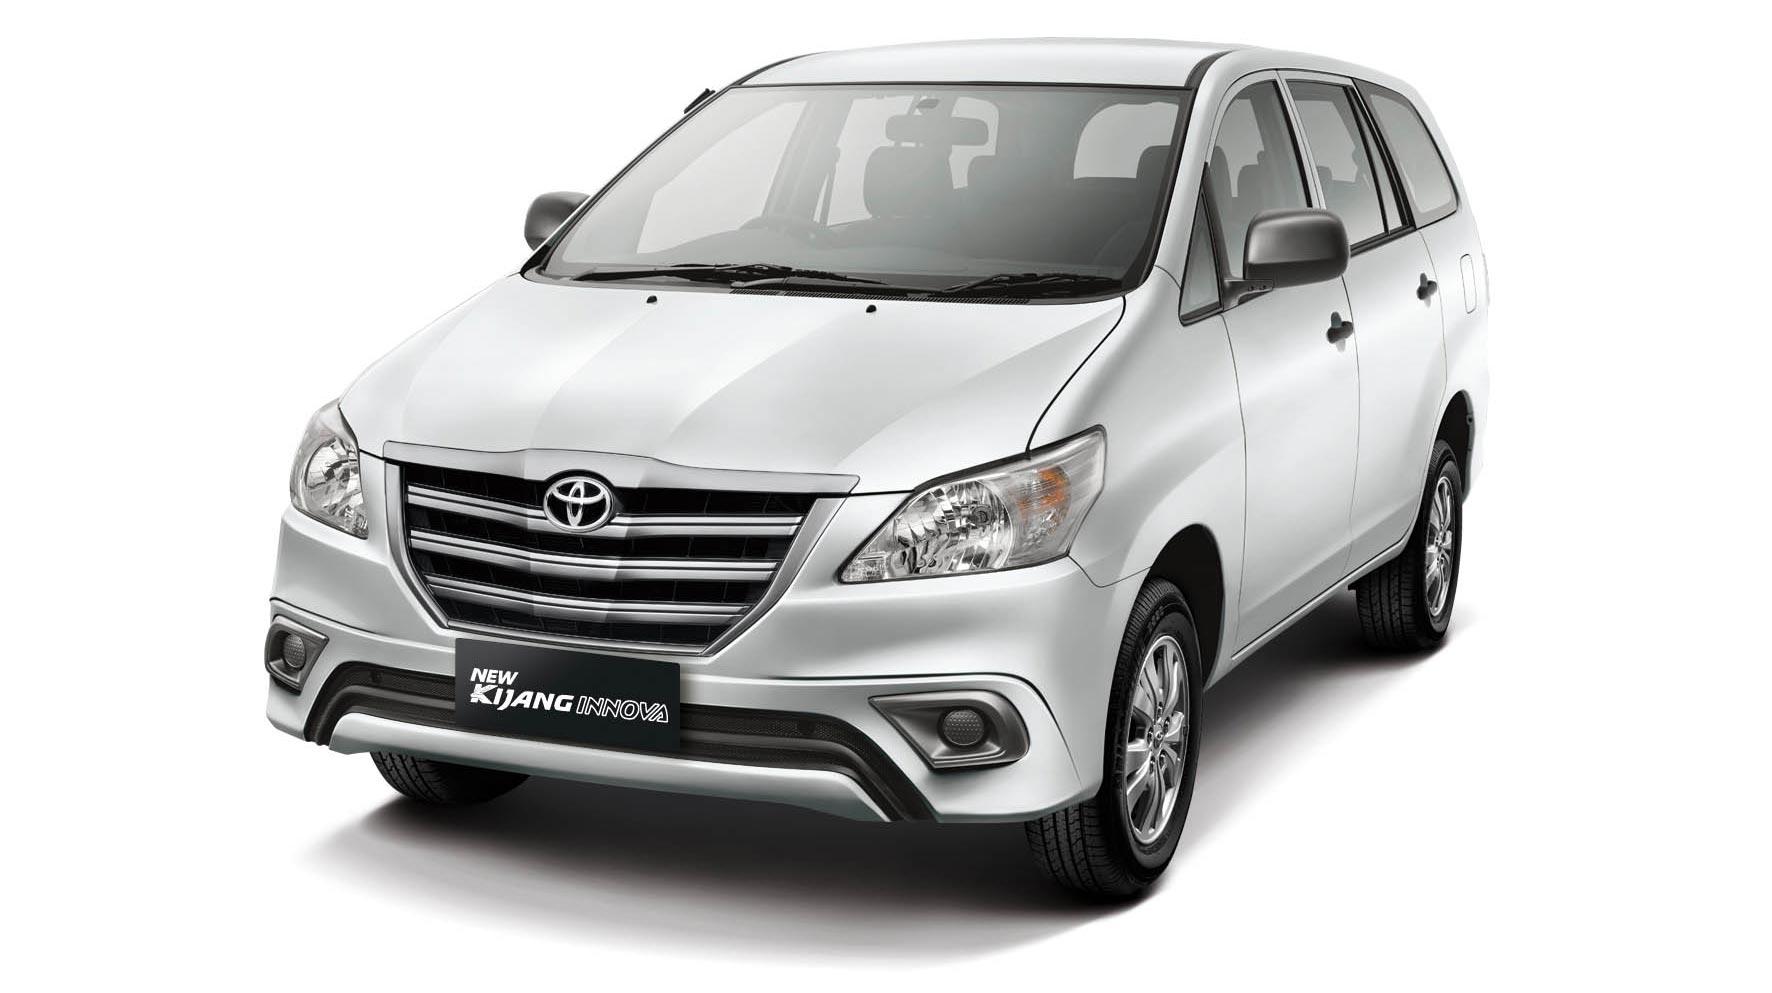 Toyota Kijang Innova 2013 Tipe E